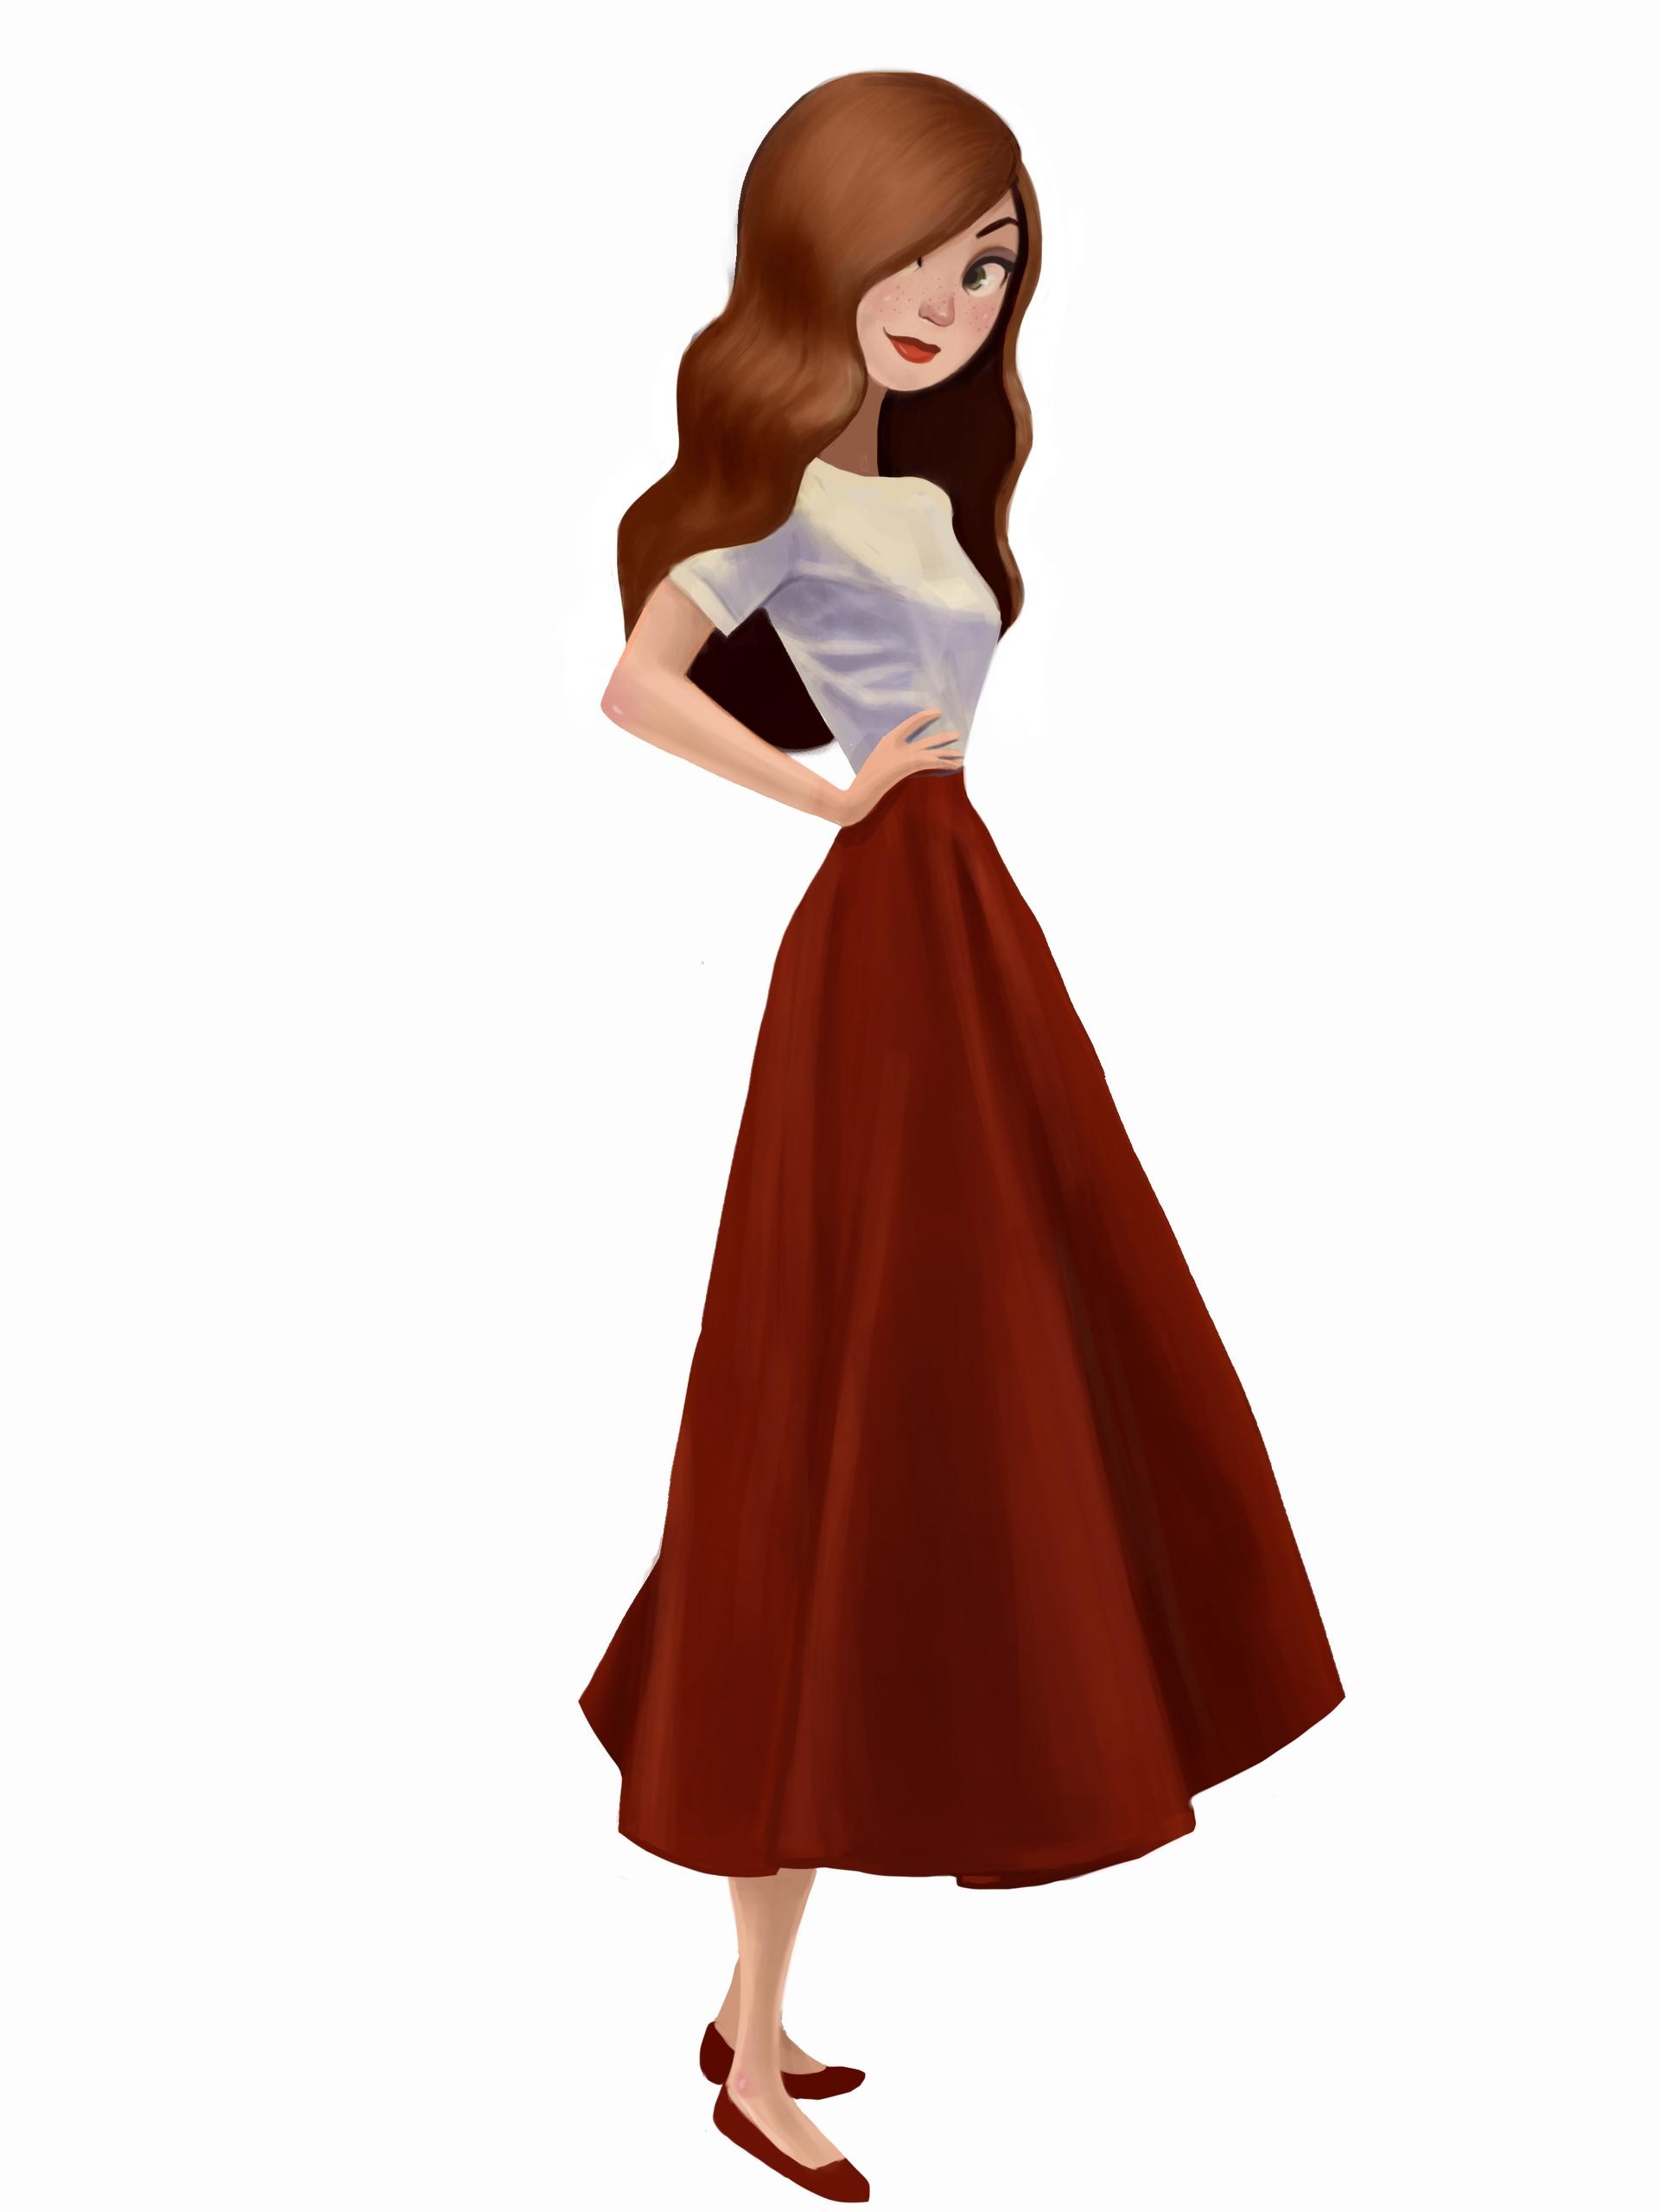 Red Head - fashion, vintage, girl - ashleyodell | ello